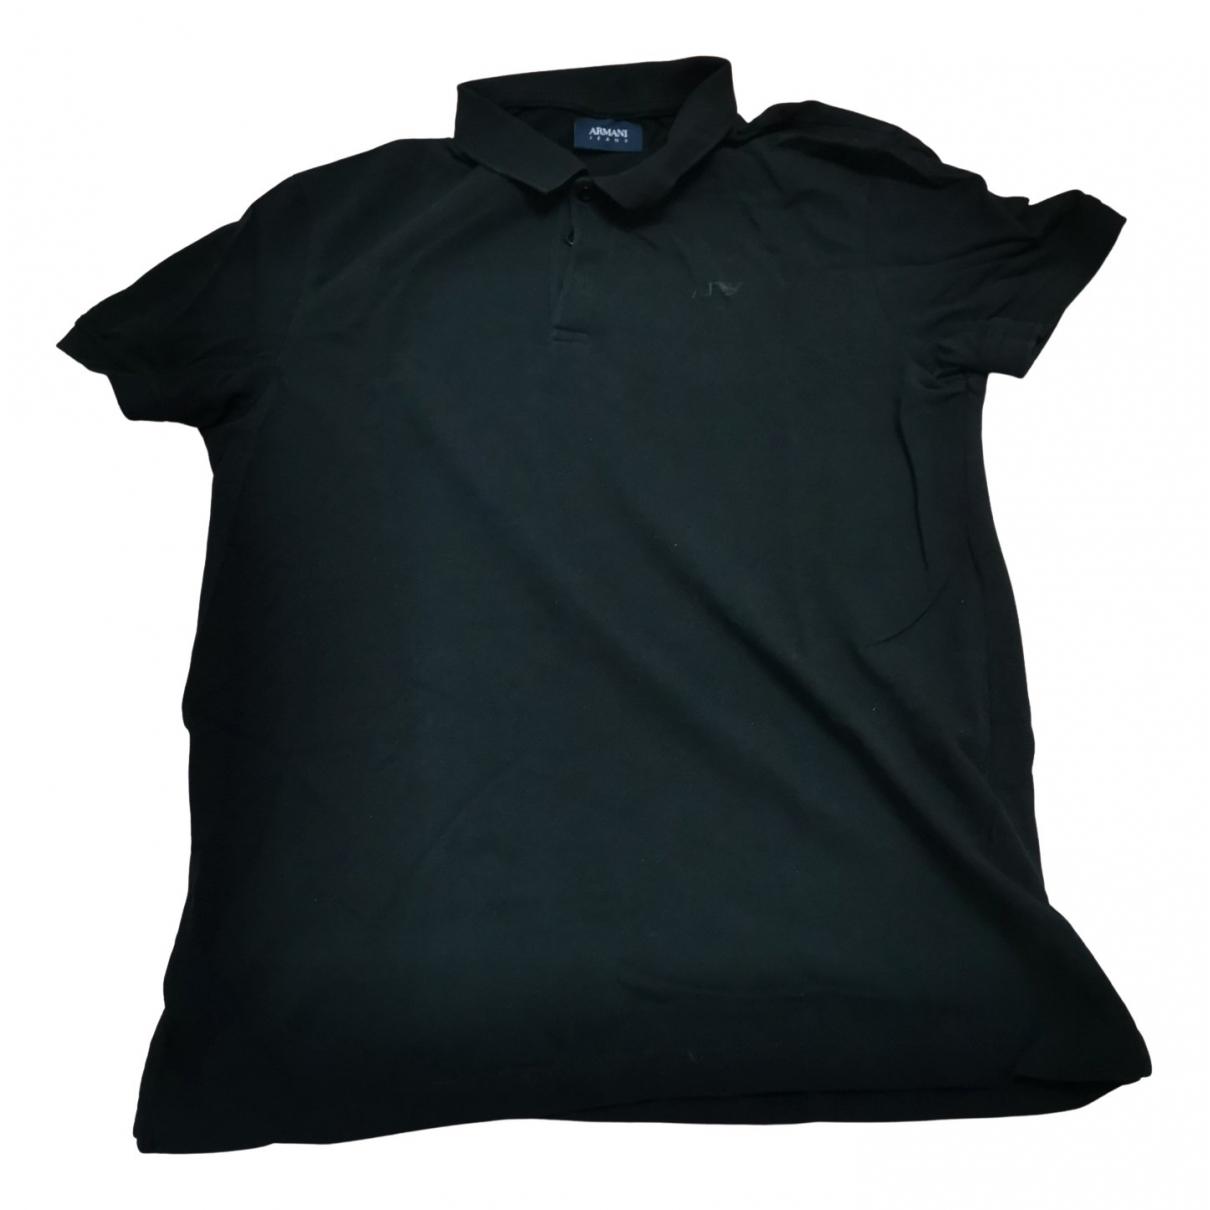 Polo en Algodon Negro Armani Jeans